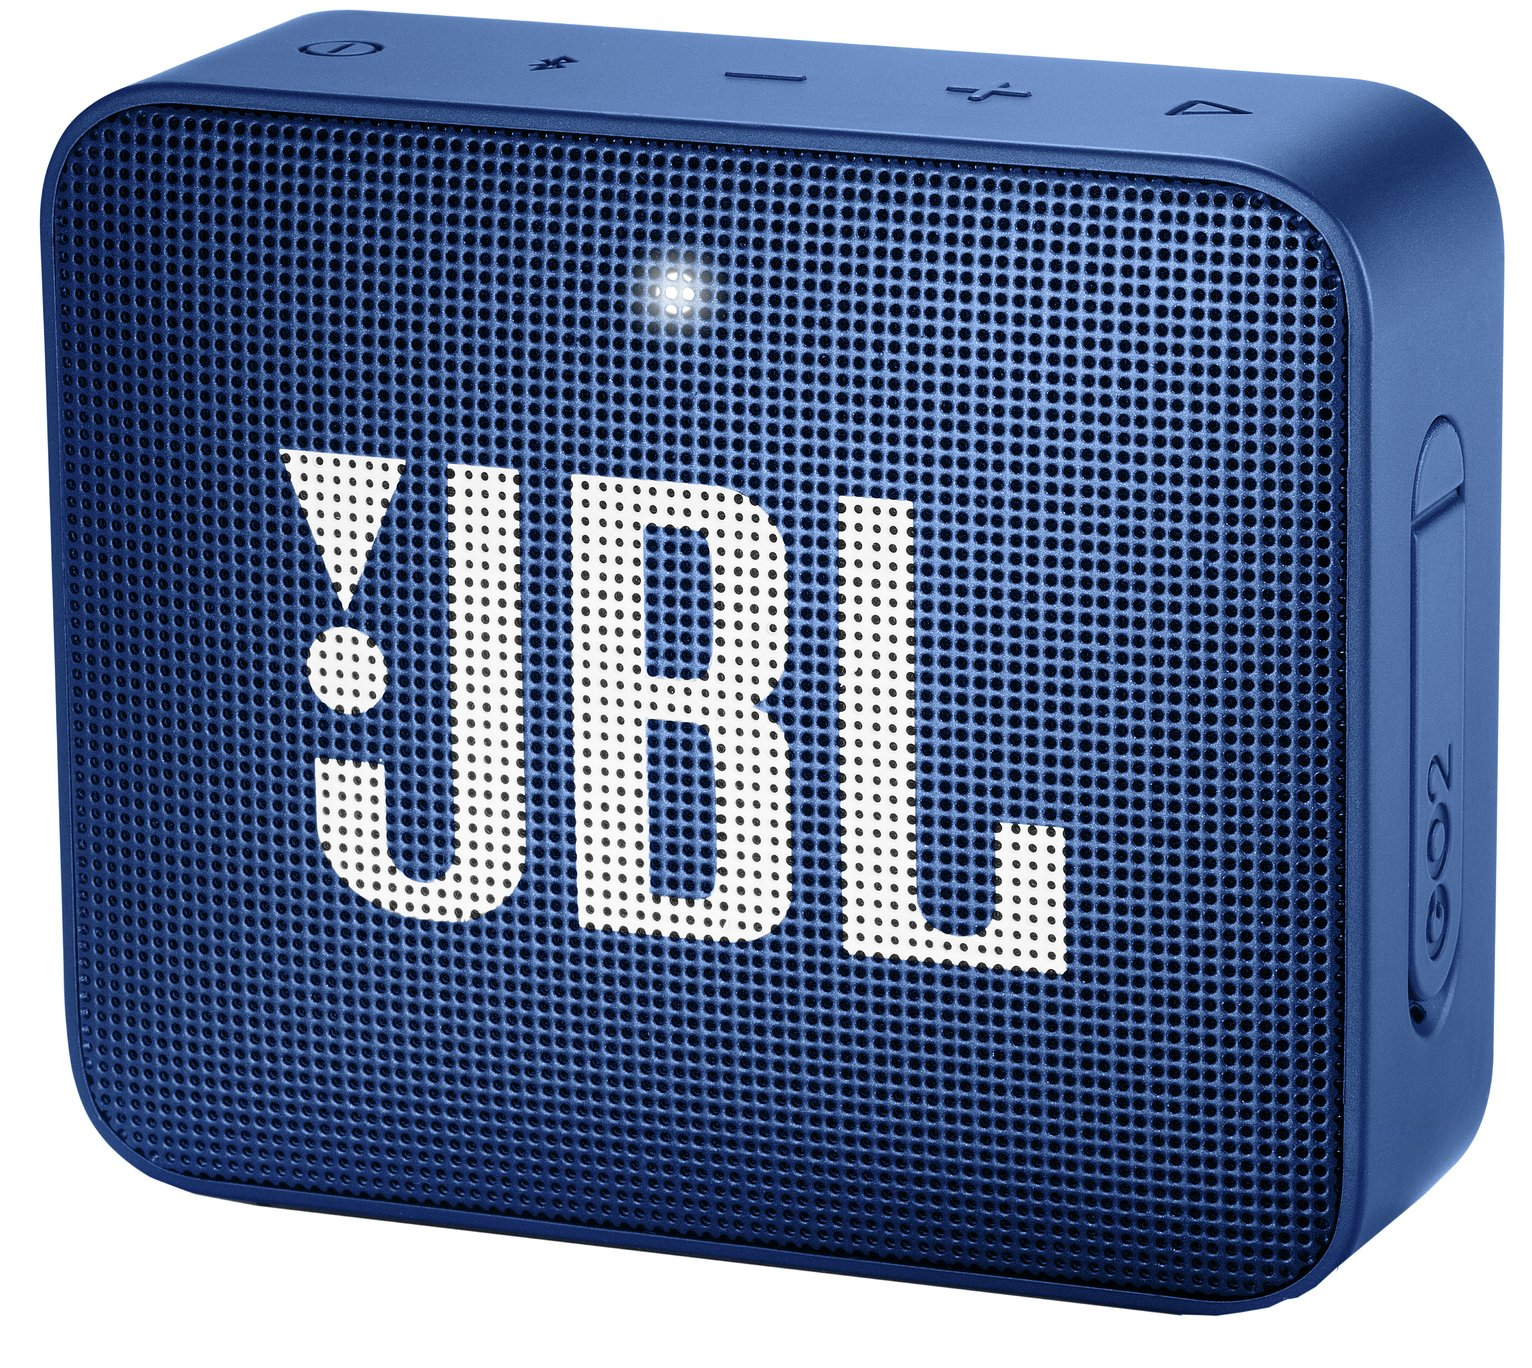 JBL Go 2 Portable Wireless Speaker - Blue